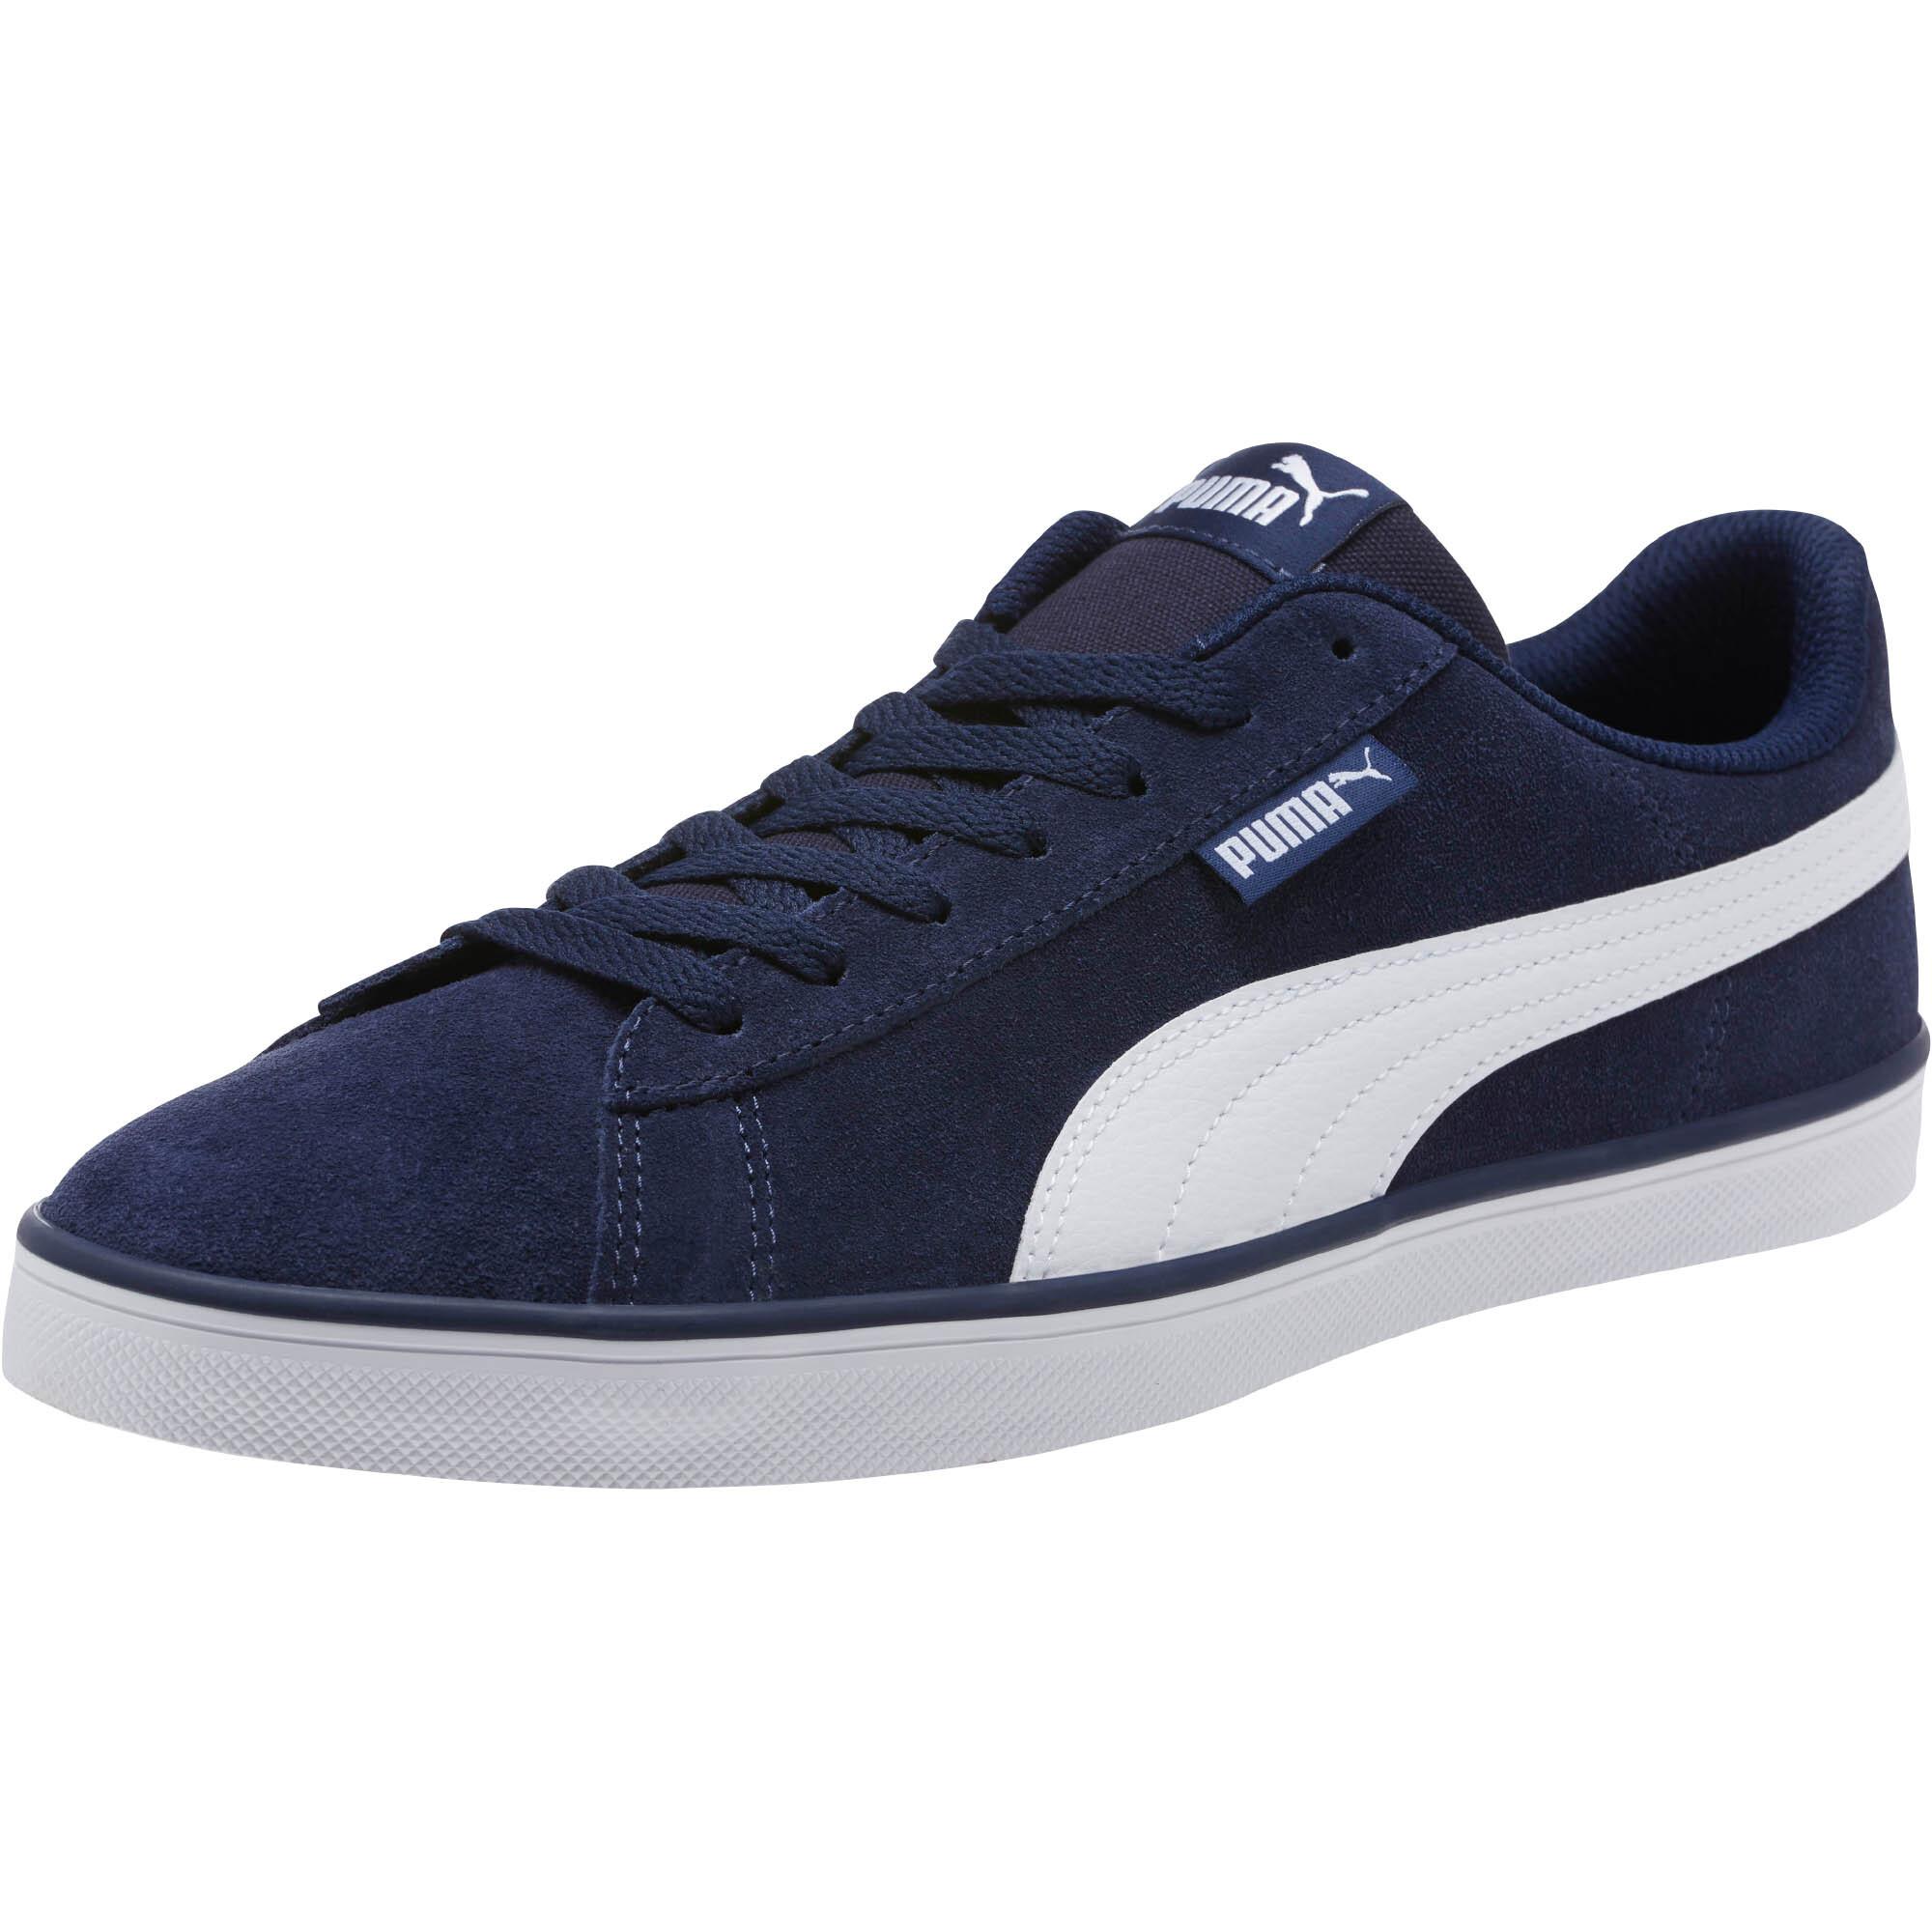 PUMA-Urban-Plus-Suede-Sneakers-Men-Shoe-Basics thumbnail 22